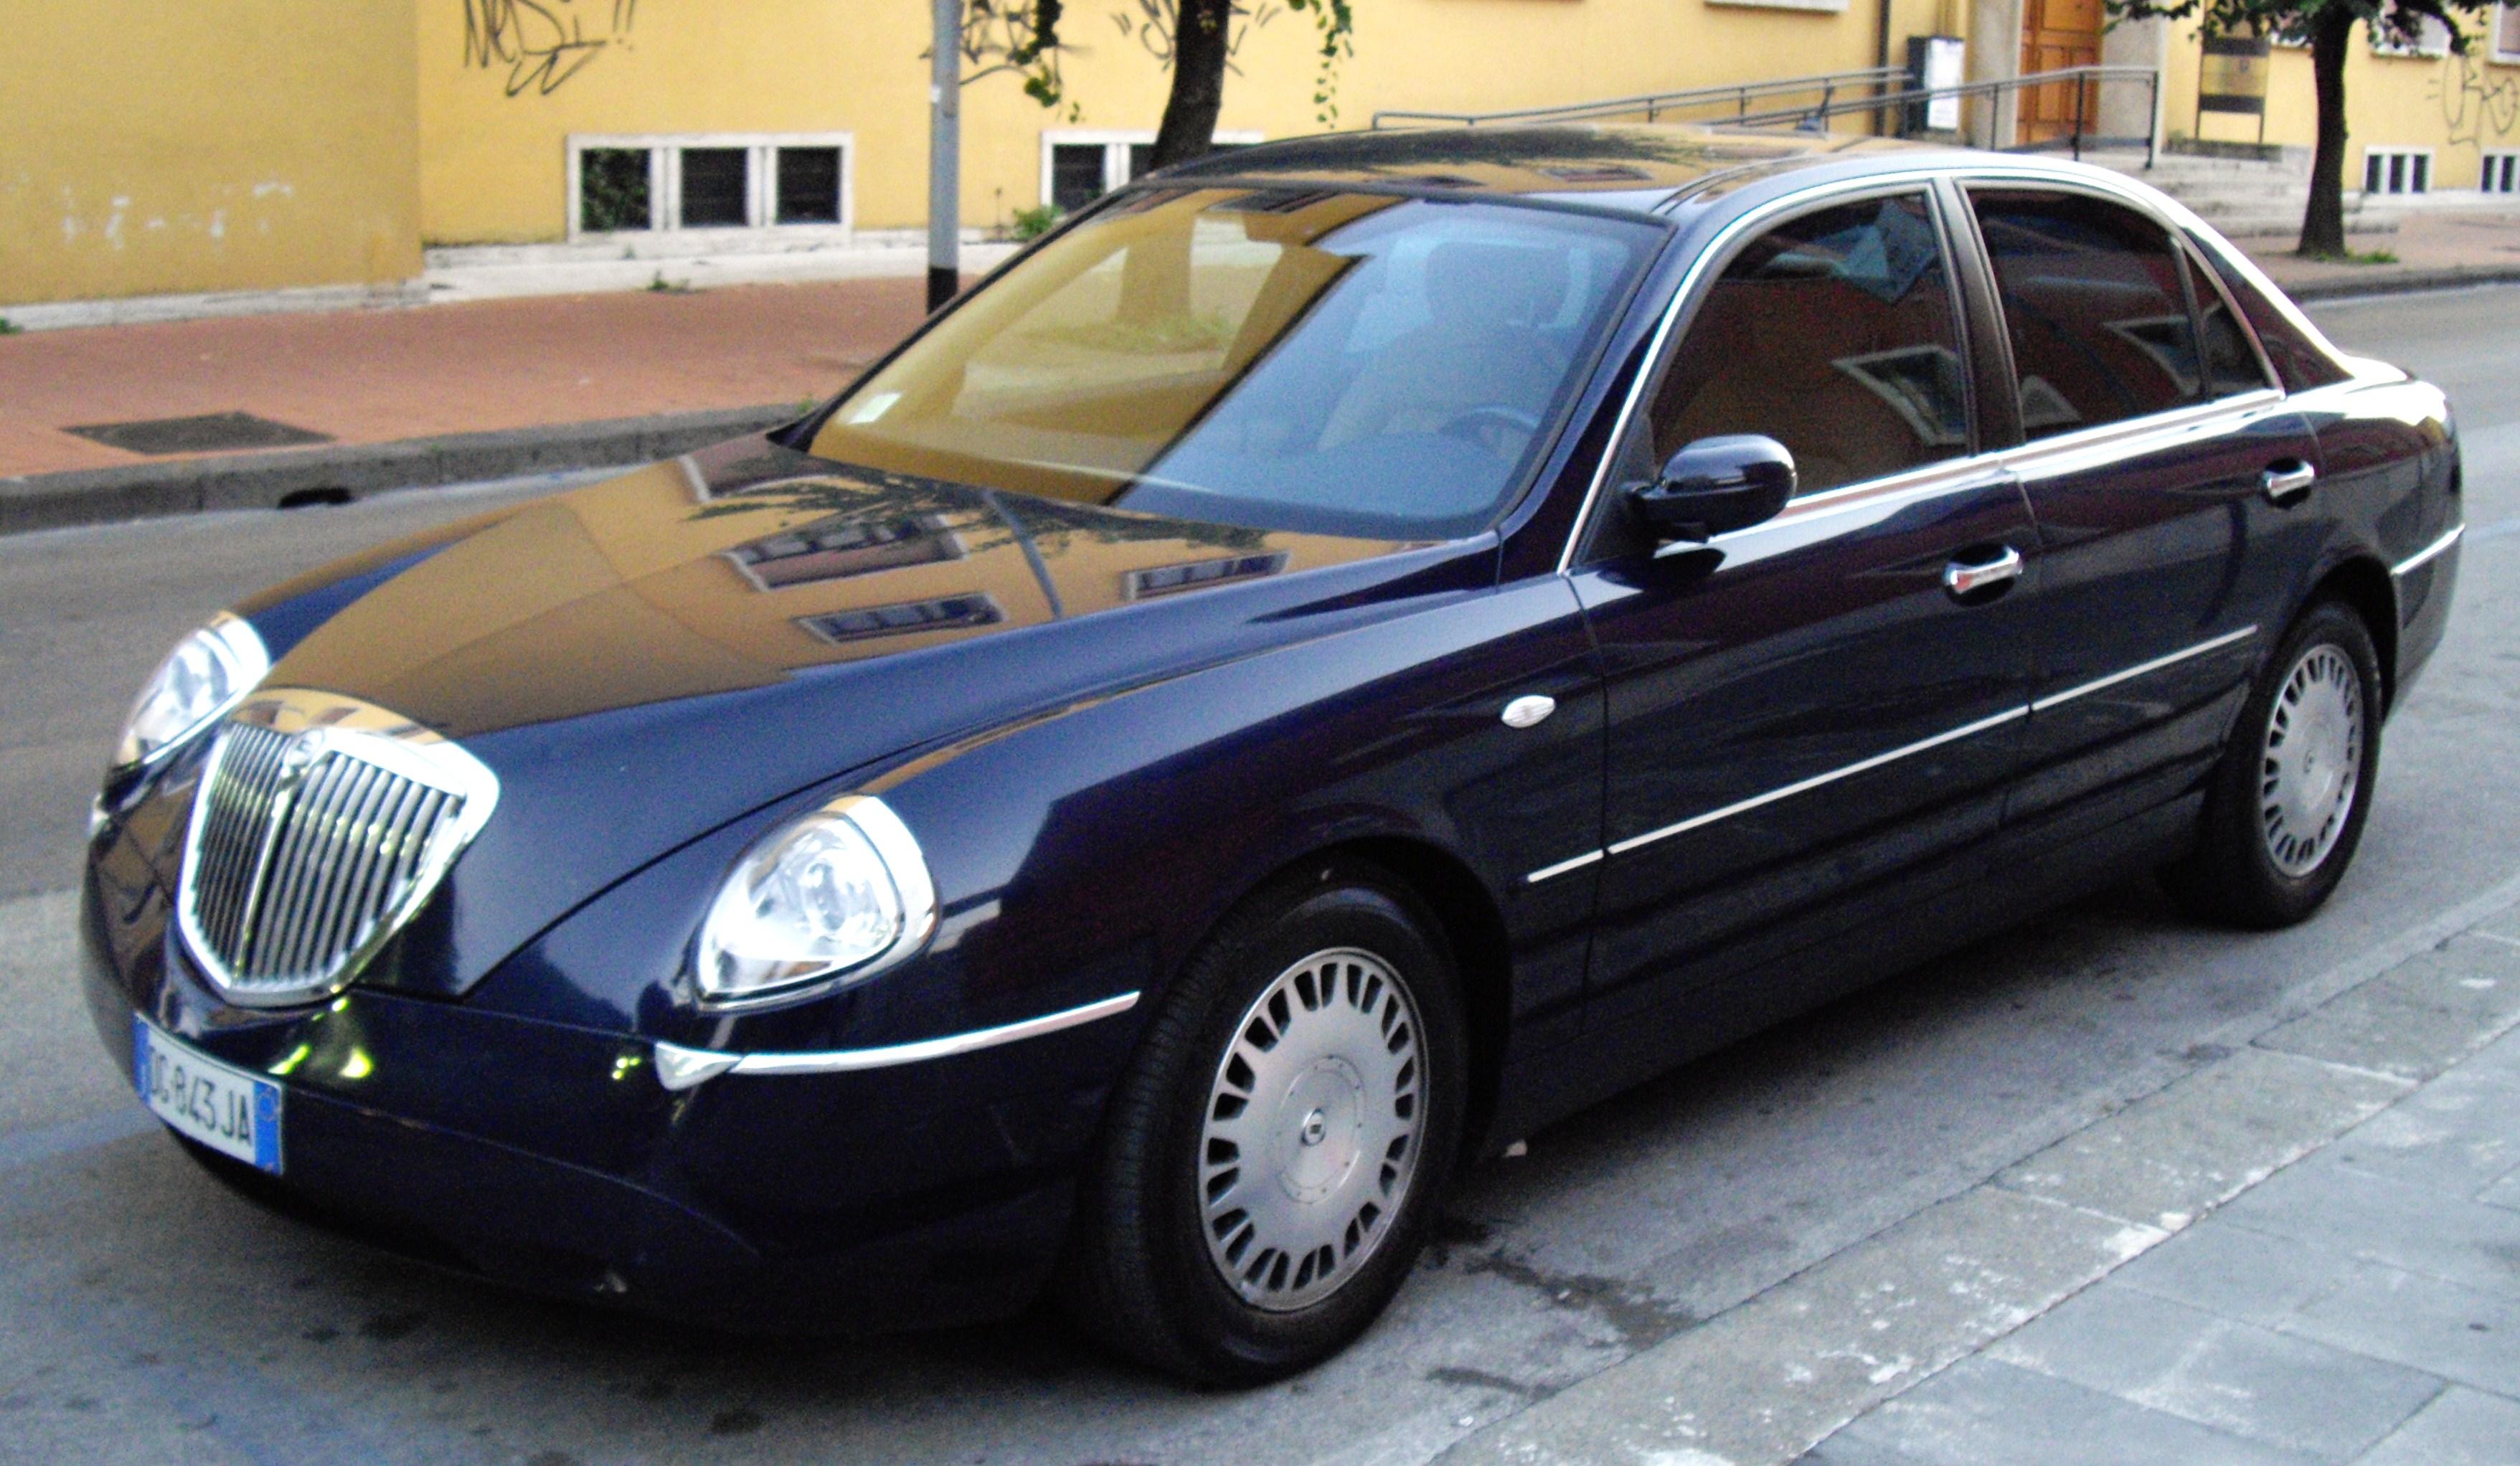 File:2004 Lancia Thesis.JPG - Wikimedia Commons